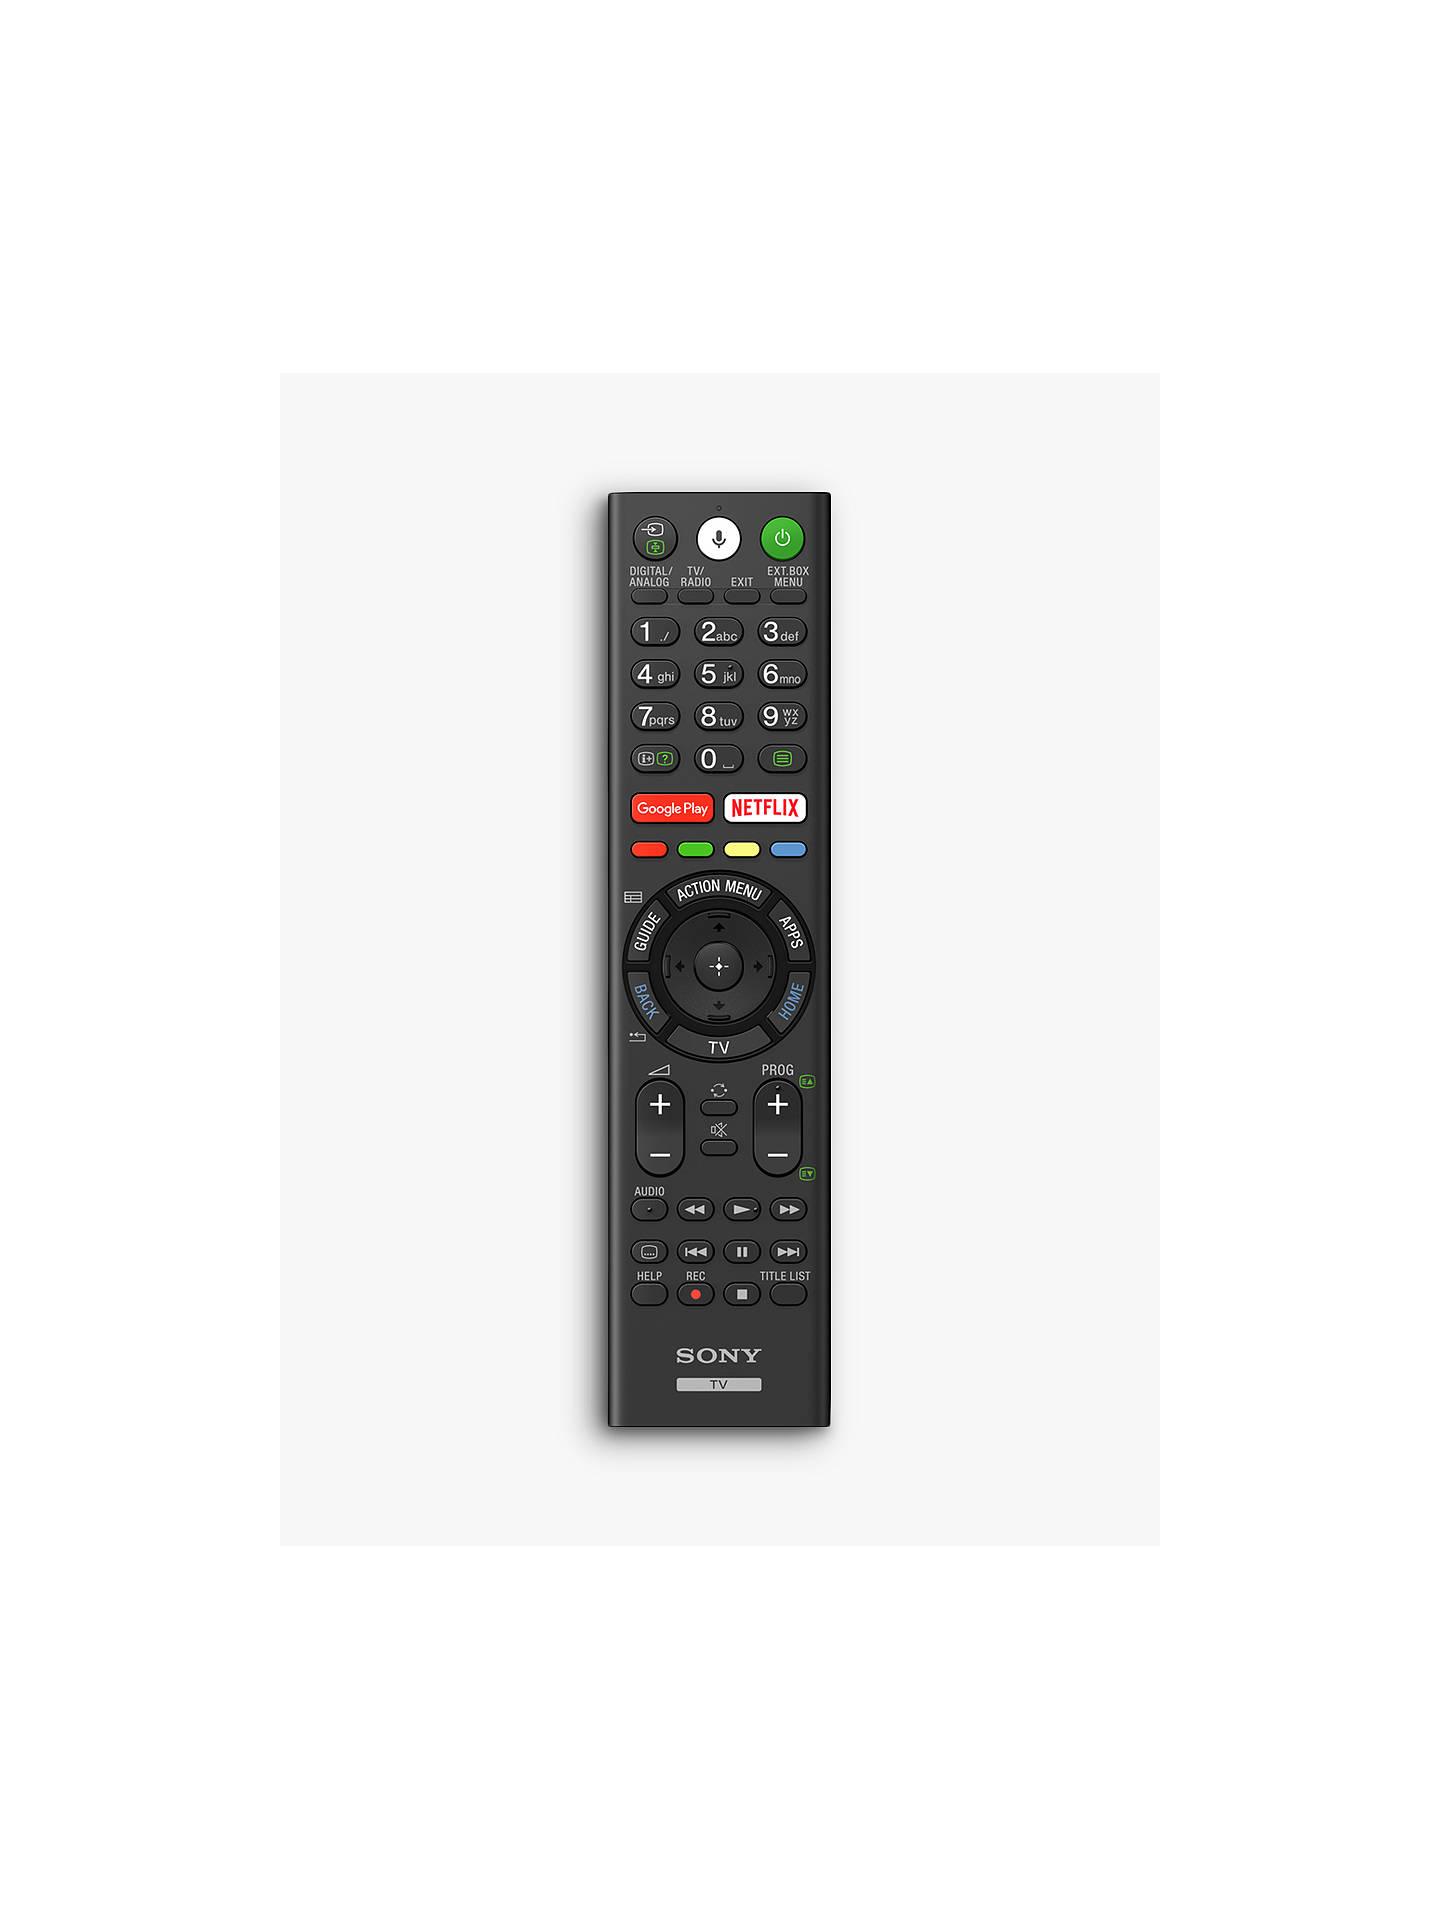 Sony Bravia KD55AF8 OLED HDR 4K Ultra HD Smart Android TV, 55